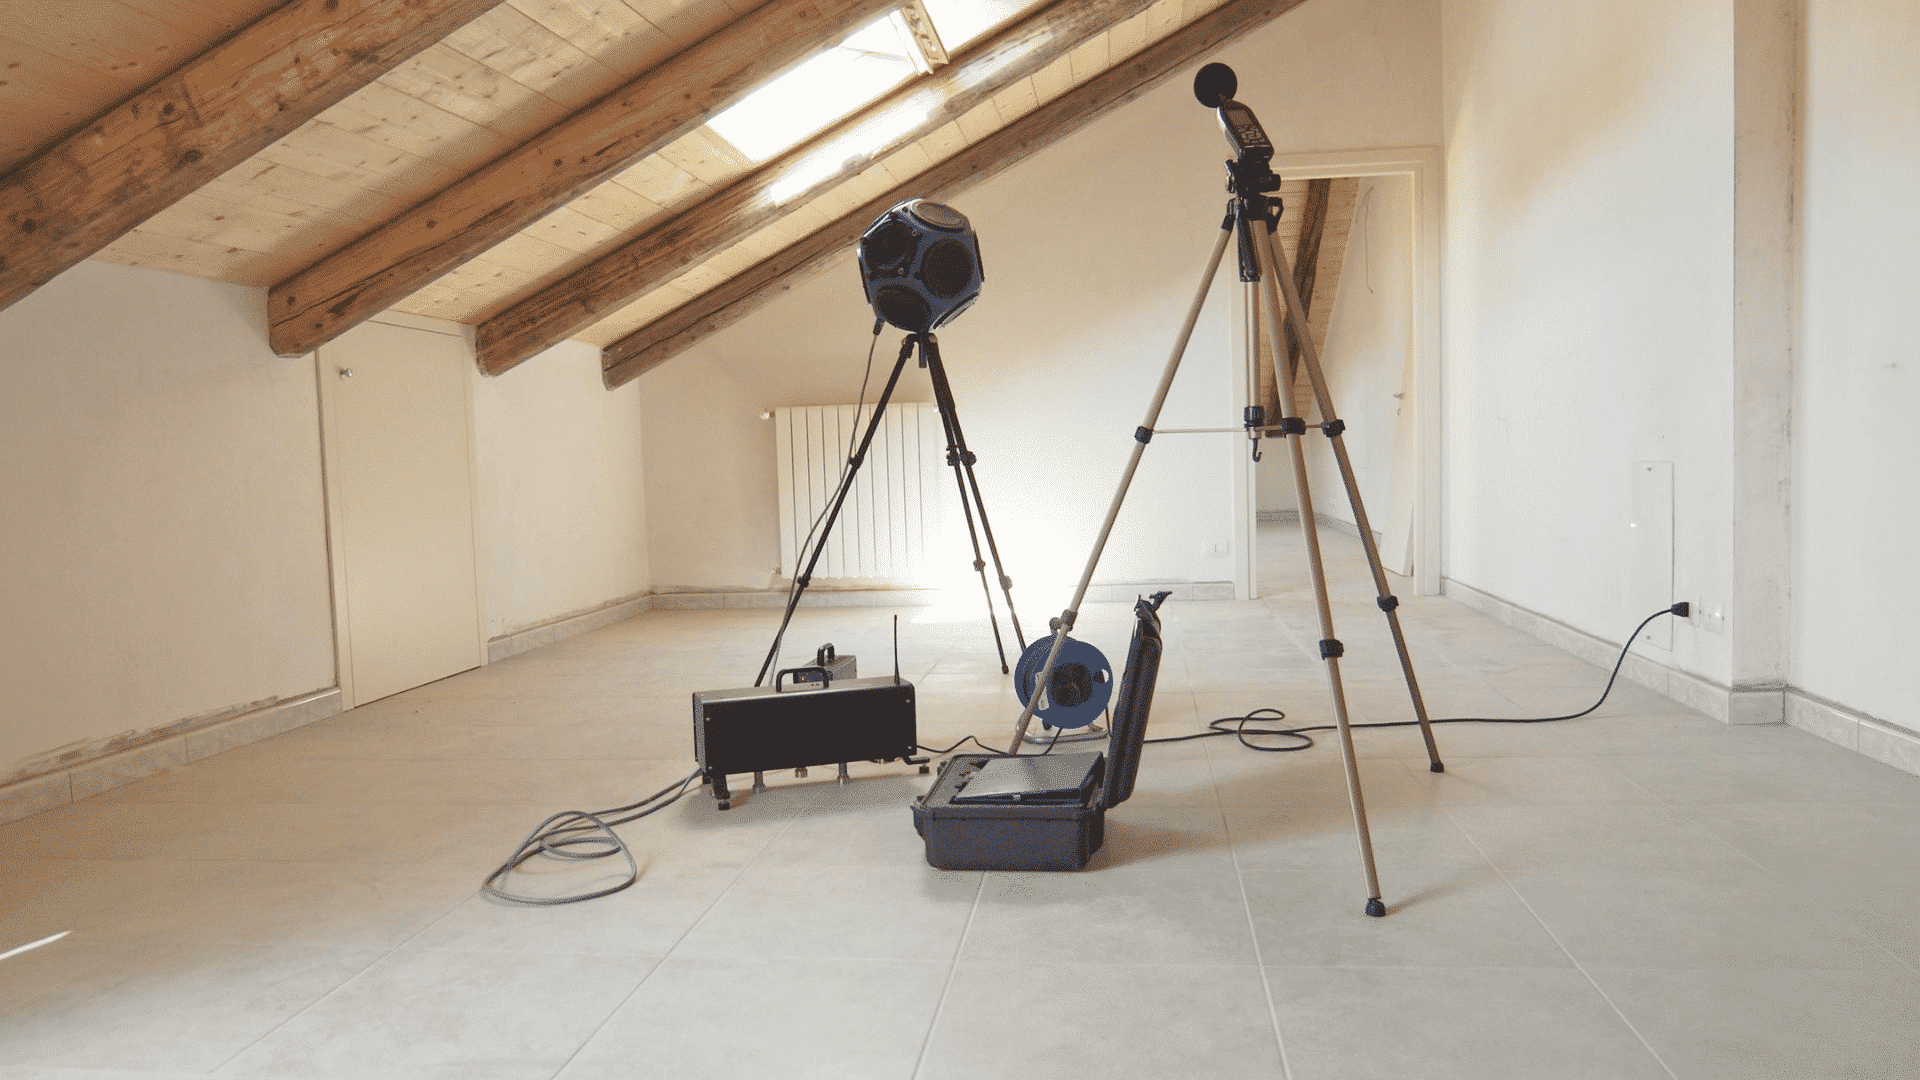 https://i-e-c.co.uk/wp-content/uploads/2020/08/Sound_Insulation_Testing_Header_Strip.png